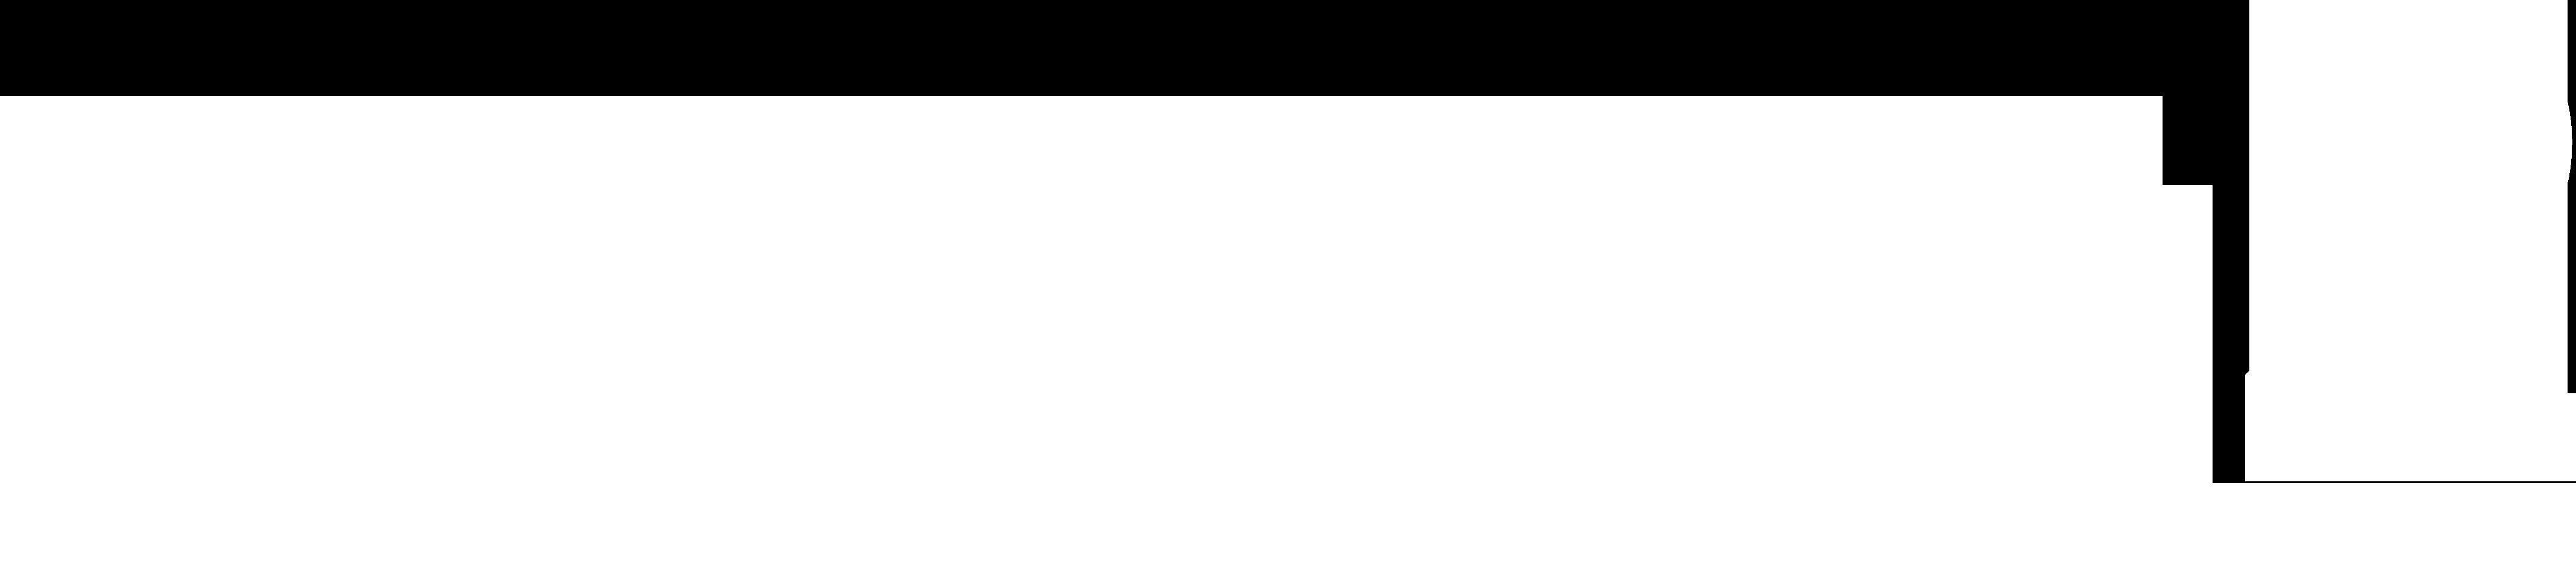 Le Canal 2